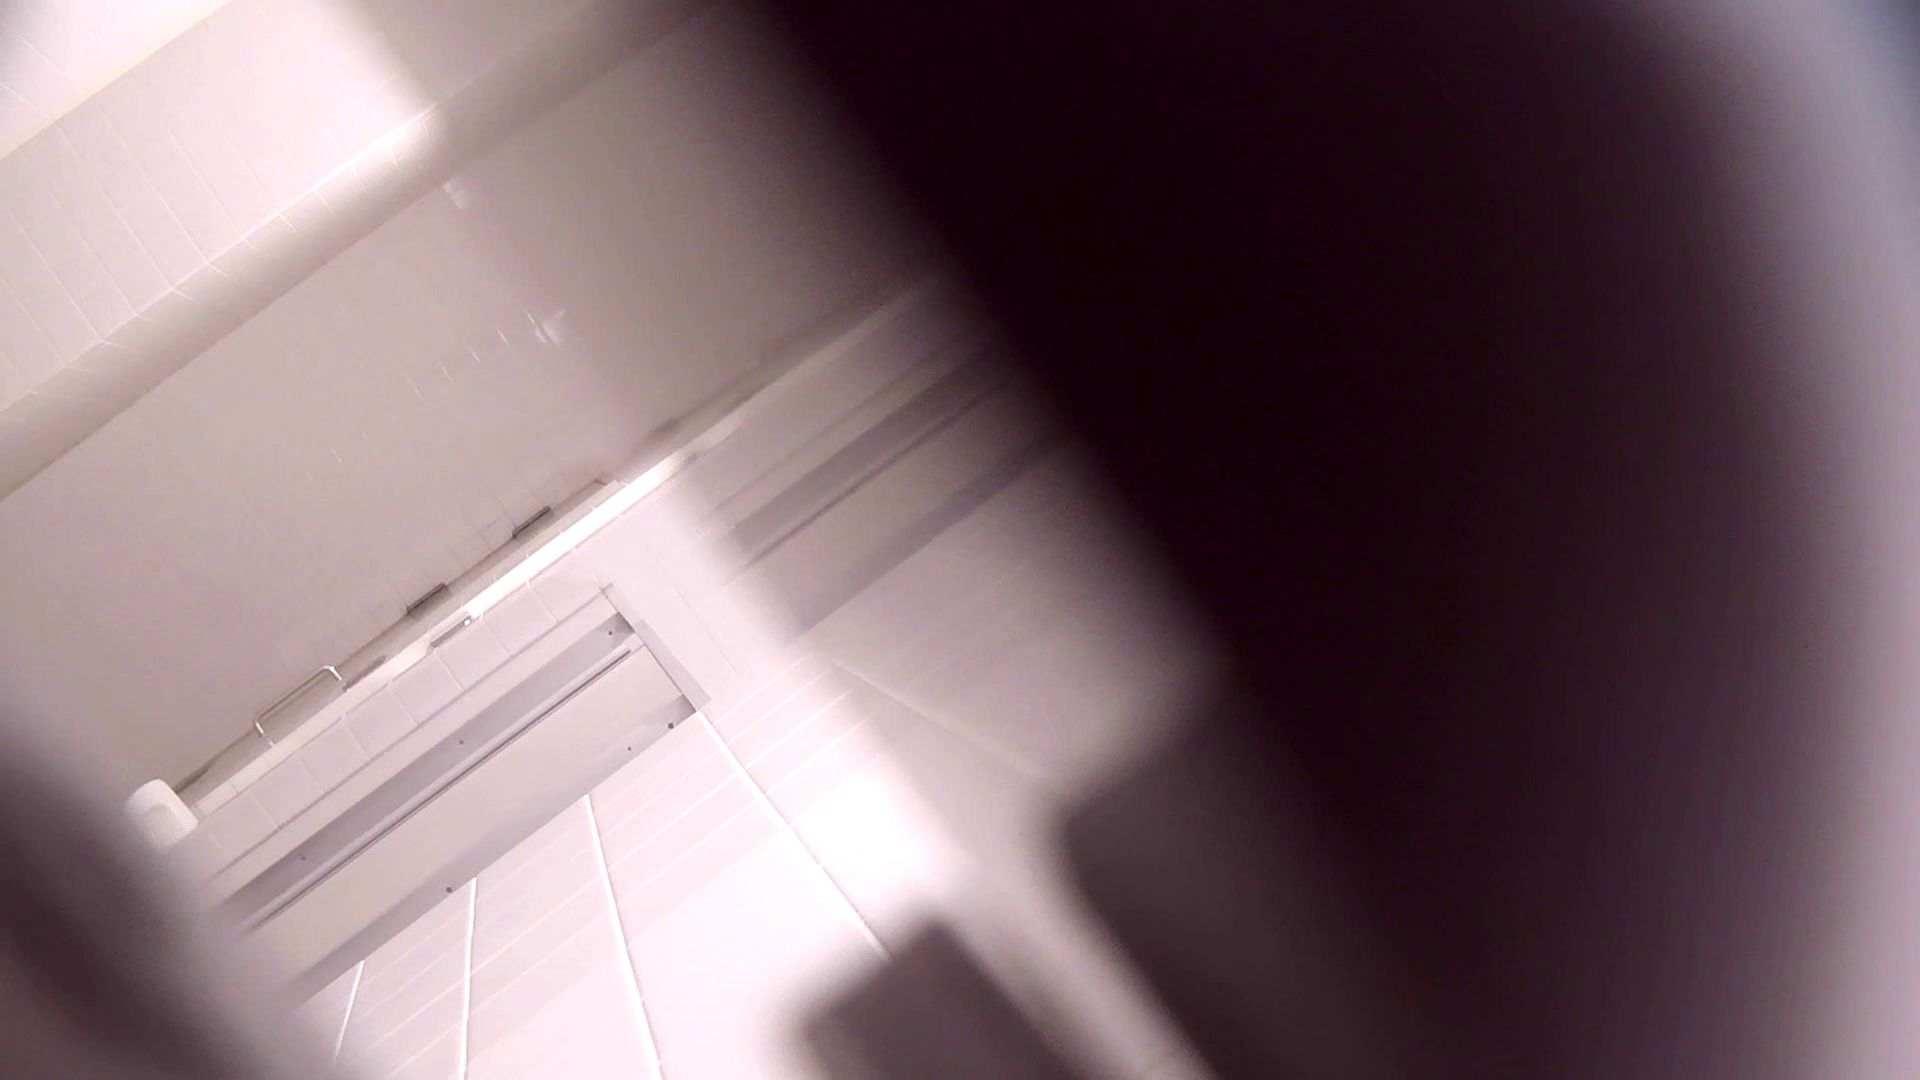 vol.17 命がけ潜伏洗面所! 張り裂けんばかりの大物 プライベート 盗撮ワレメ無修正動画無料 108画像 67